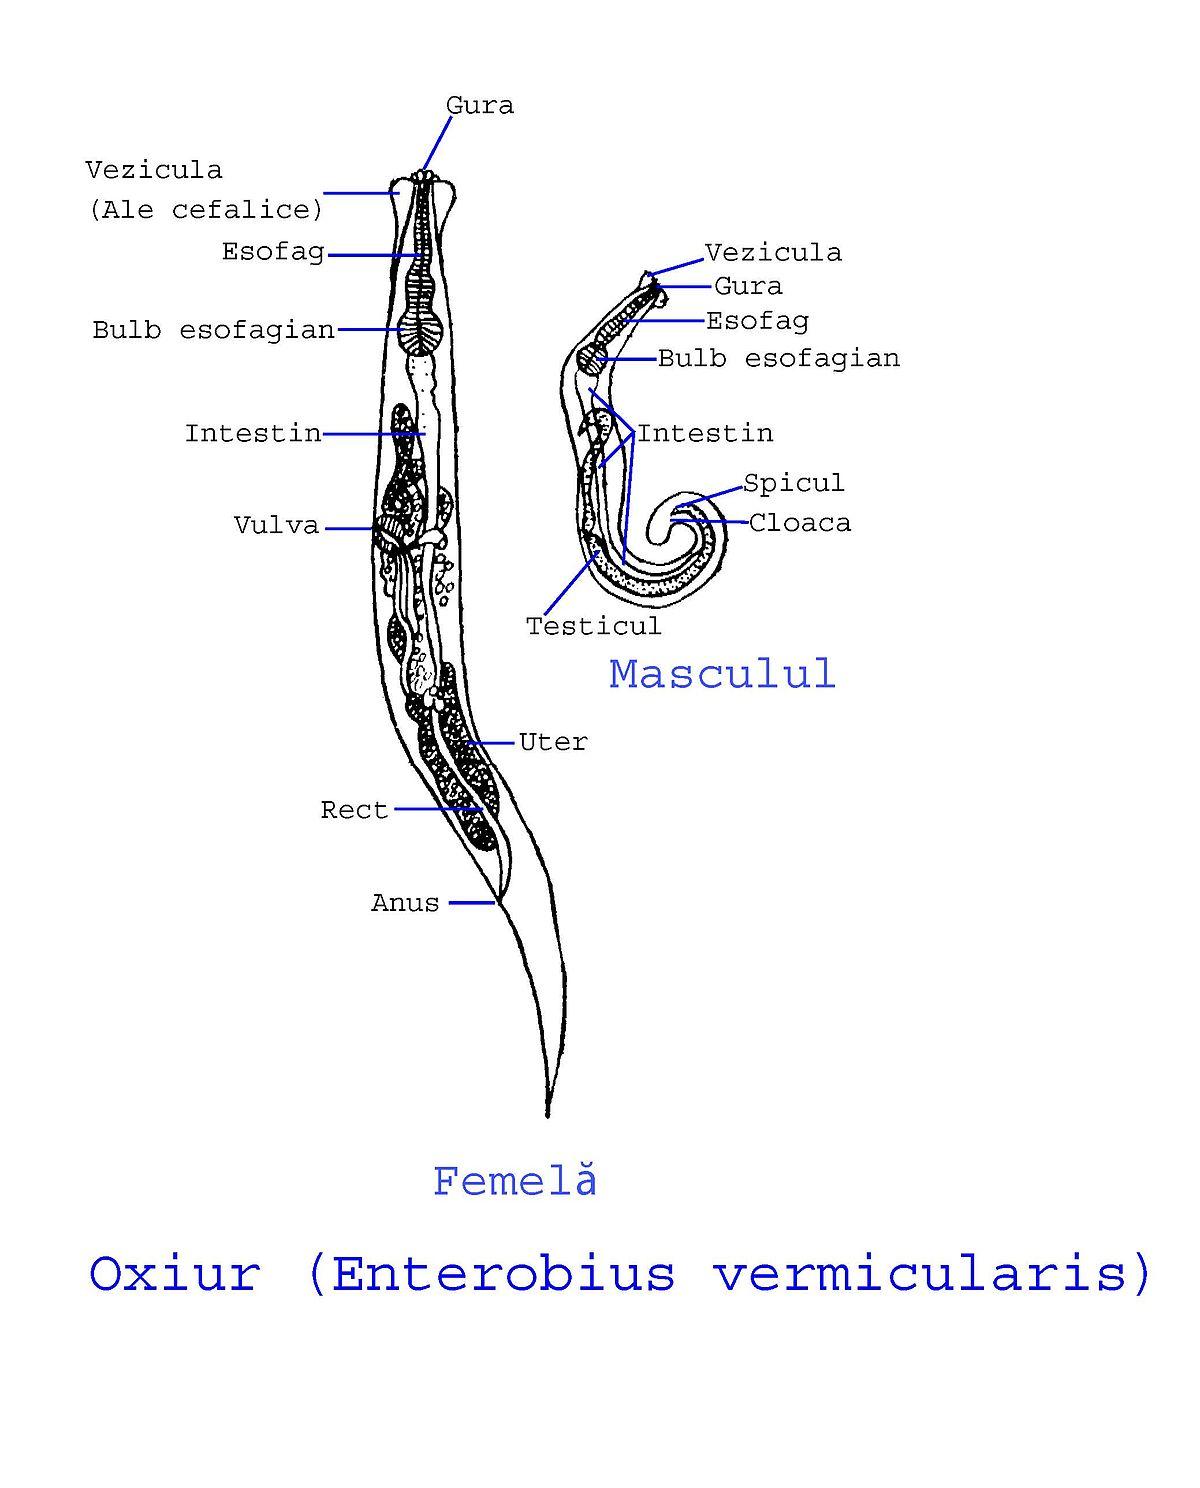 nome cientifico oxiurus